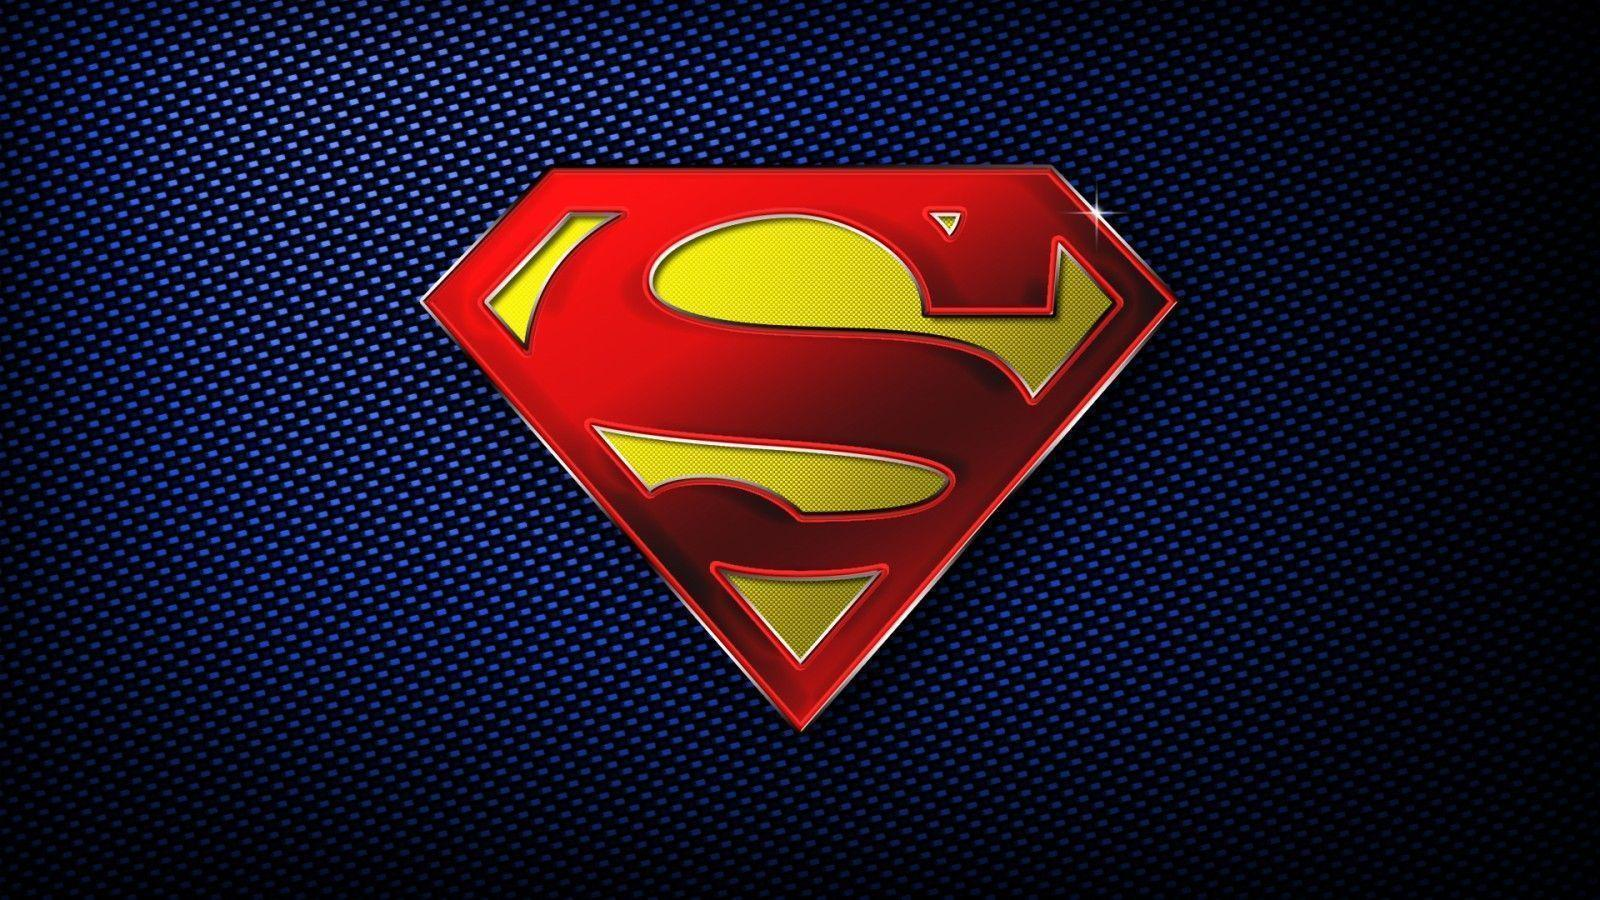 Superman Logo Wallpapers Top Free Superman Logo Backgrounds Wallpaperaccess